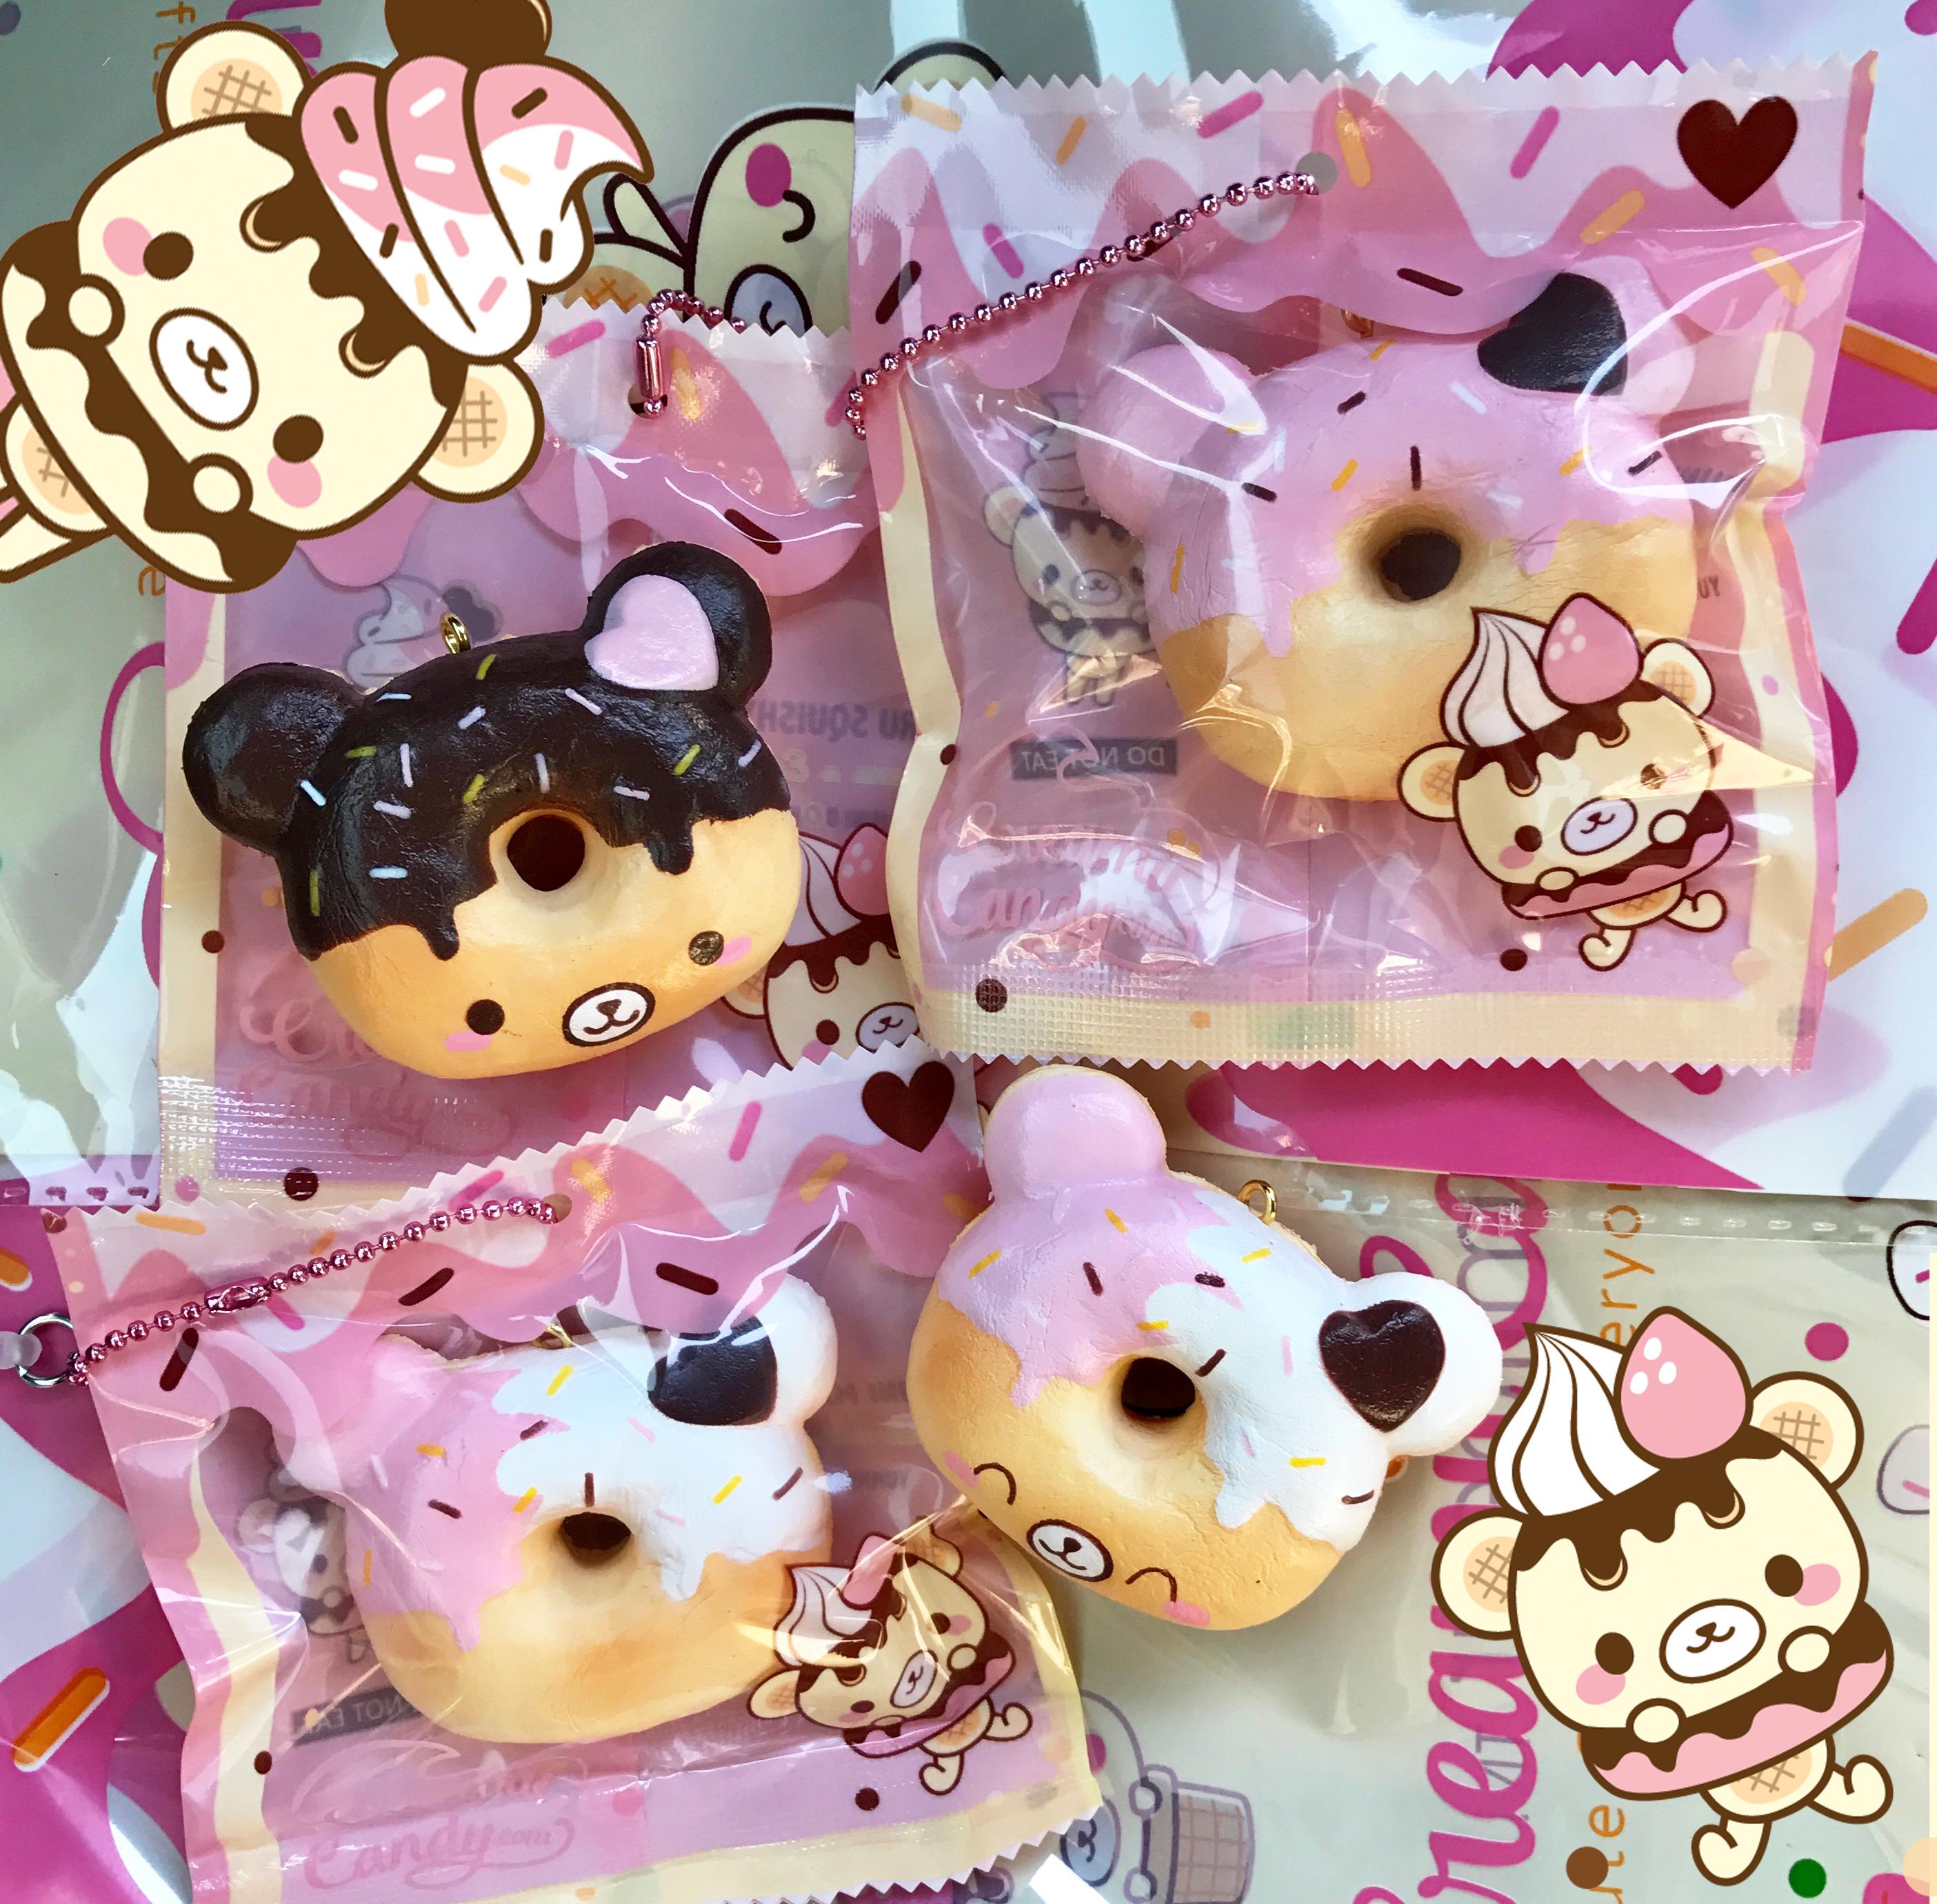 Squishy Yummiibear : Yummiibear Creamiicandy mini donut squishy x Puni maru